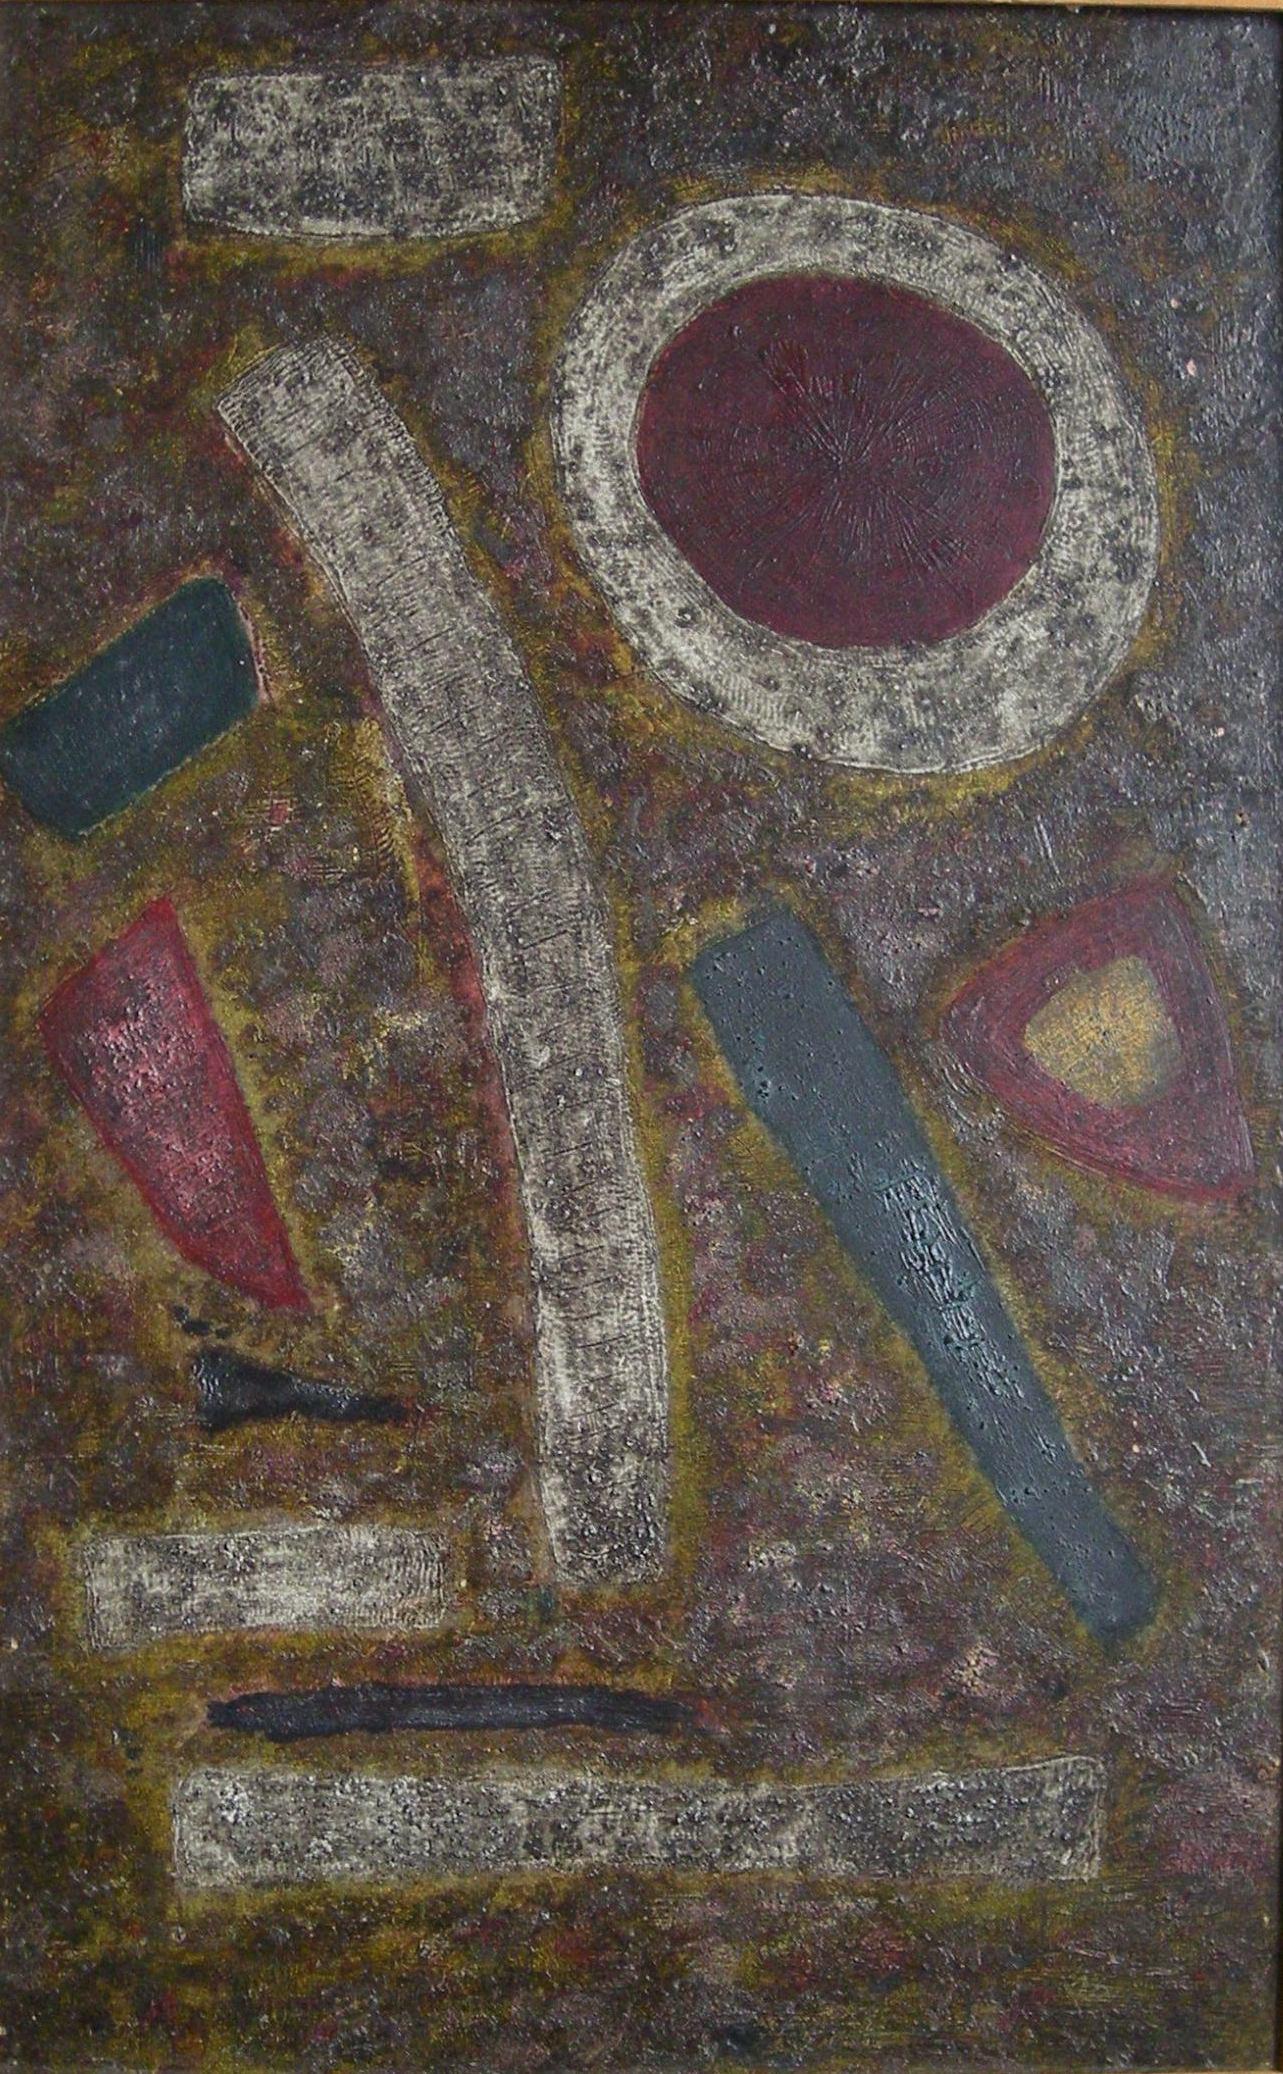 Christopherson - Hieroglyph